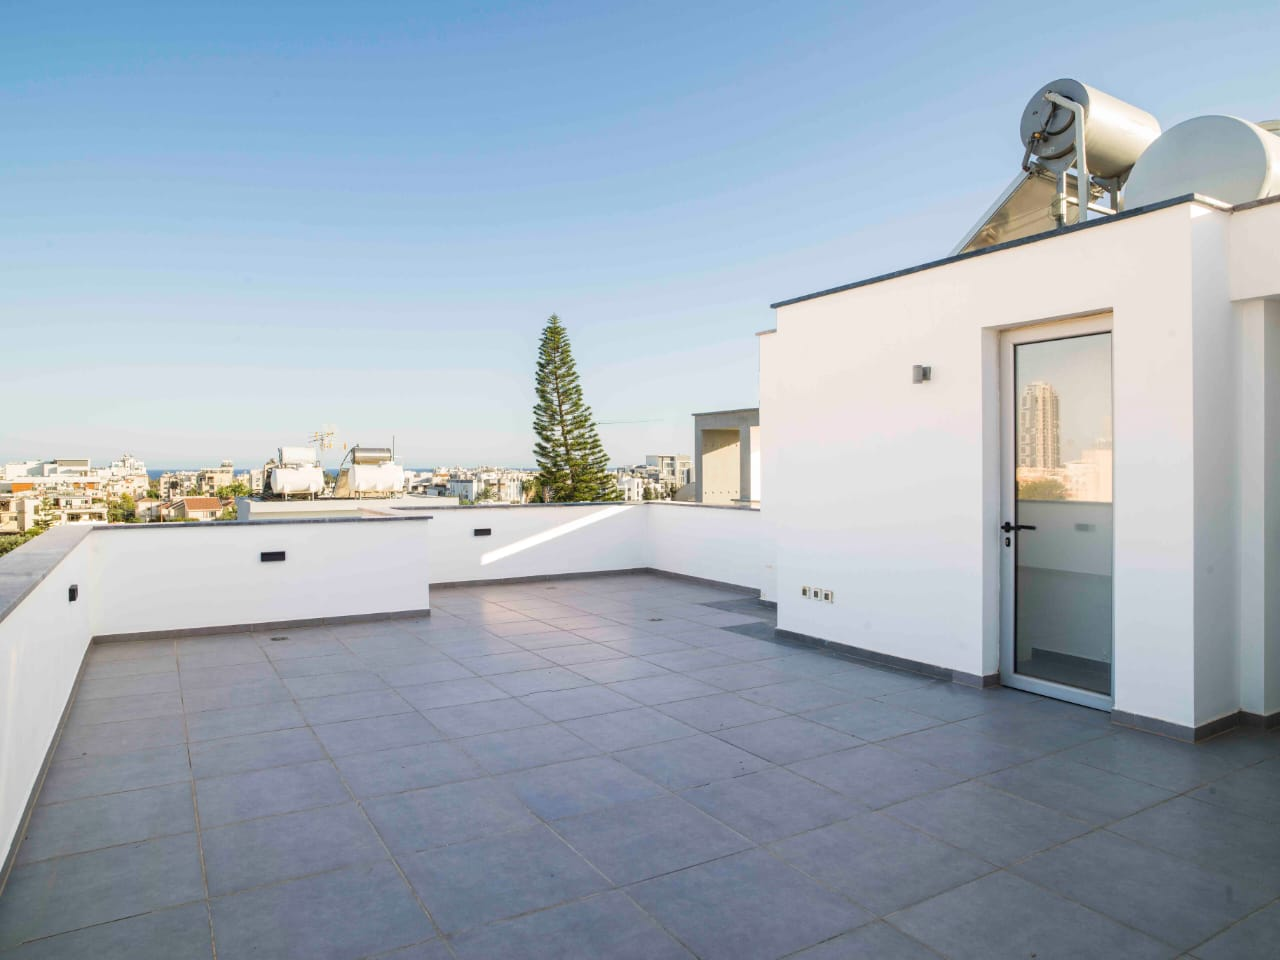 2 Bedroom Furnished Apartment Roof Garden